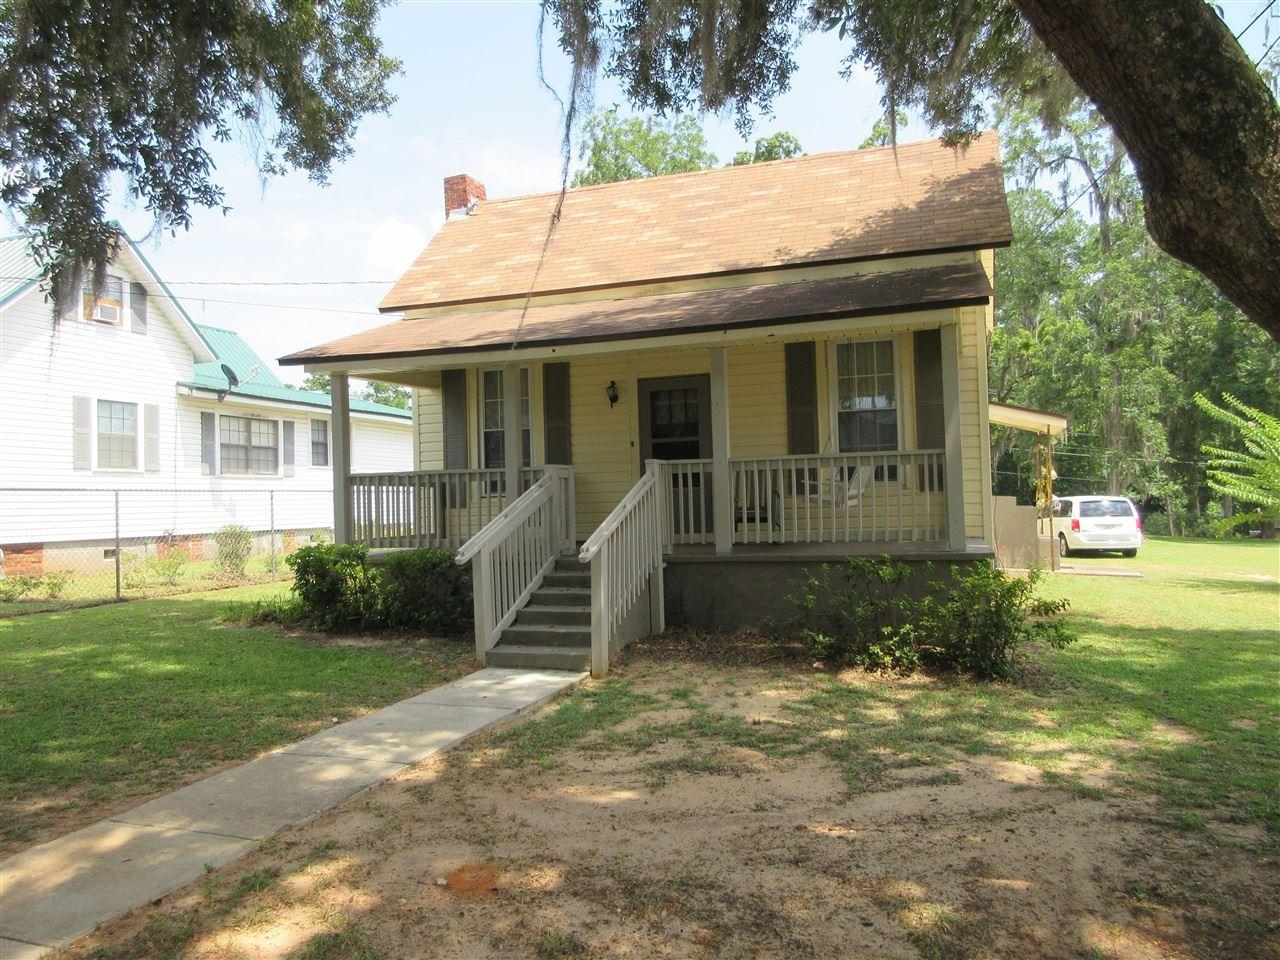 21 PATTON Street, Quincy, FL 32351 - MLS#: 335653